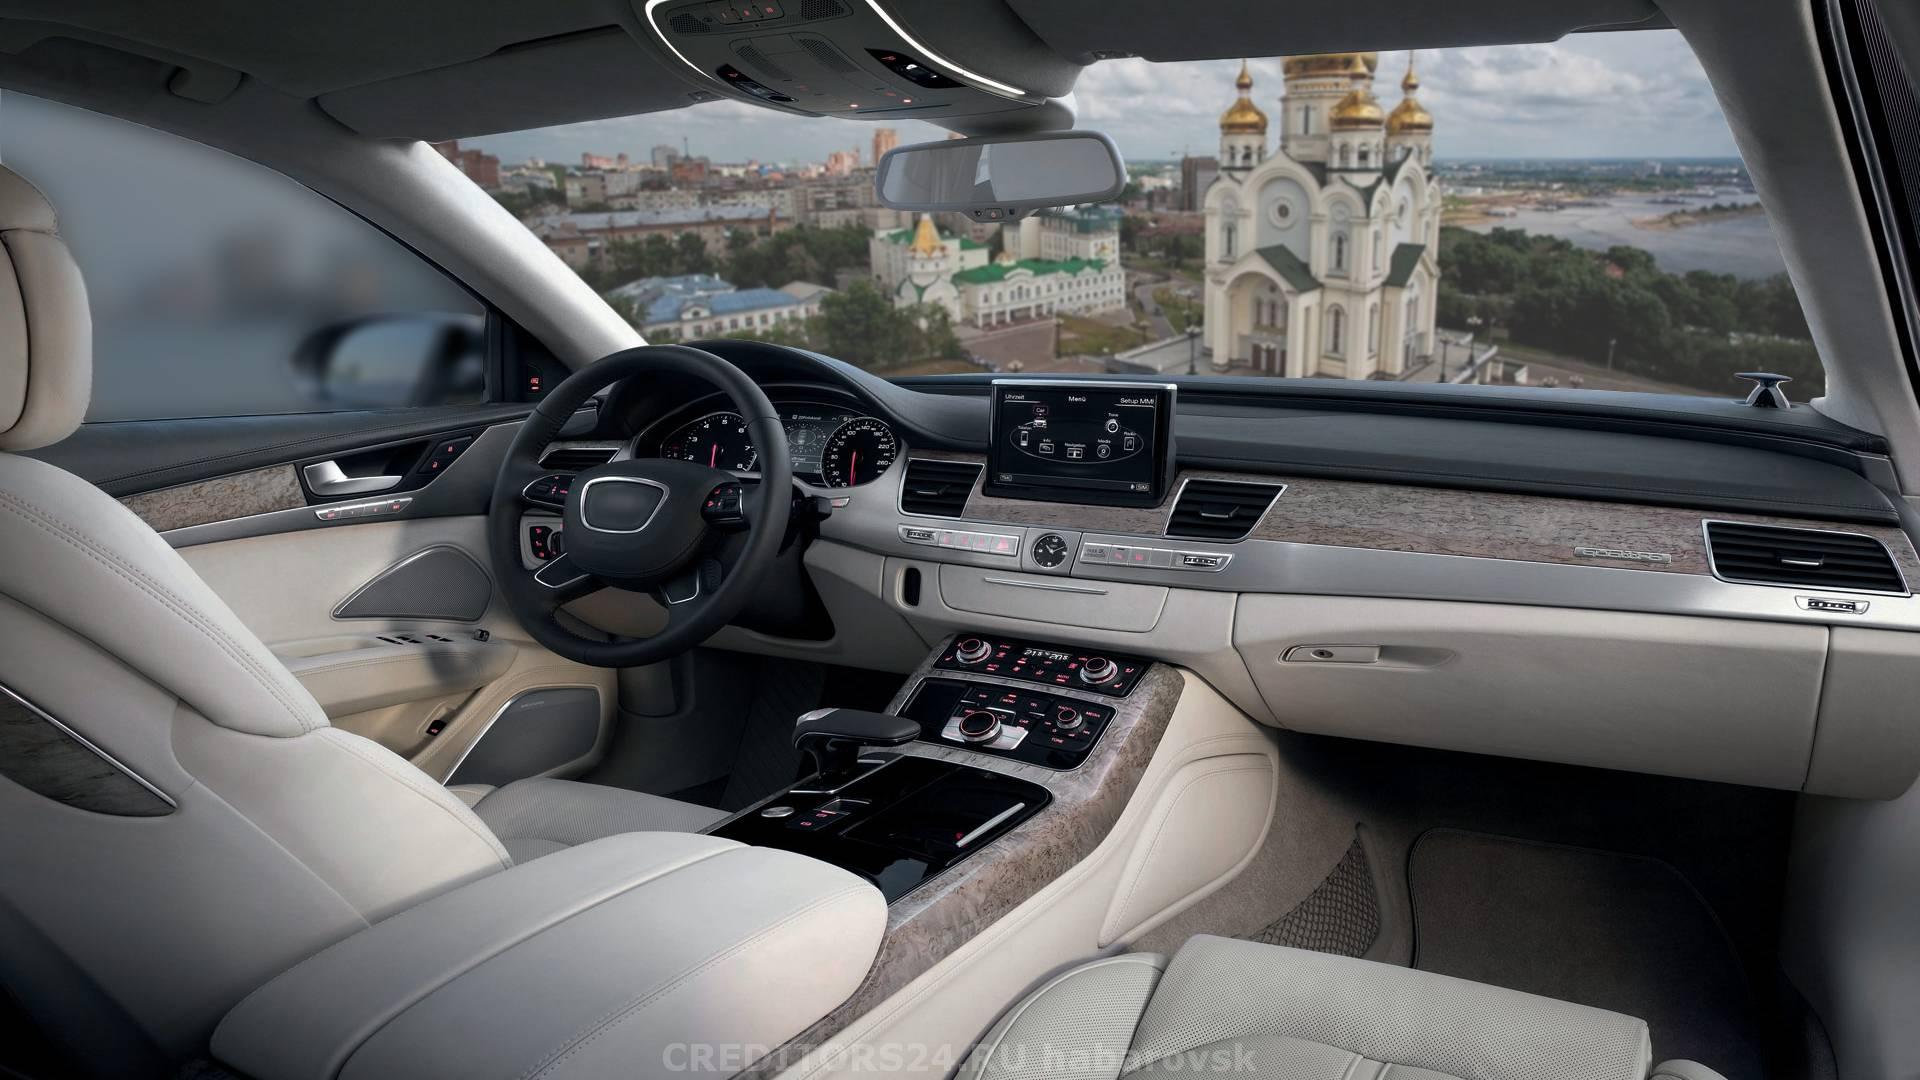 Кредиты под залог птс хабаровск автосалон 2020 москва ваз